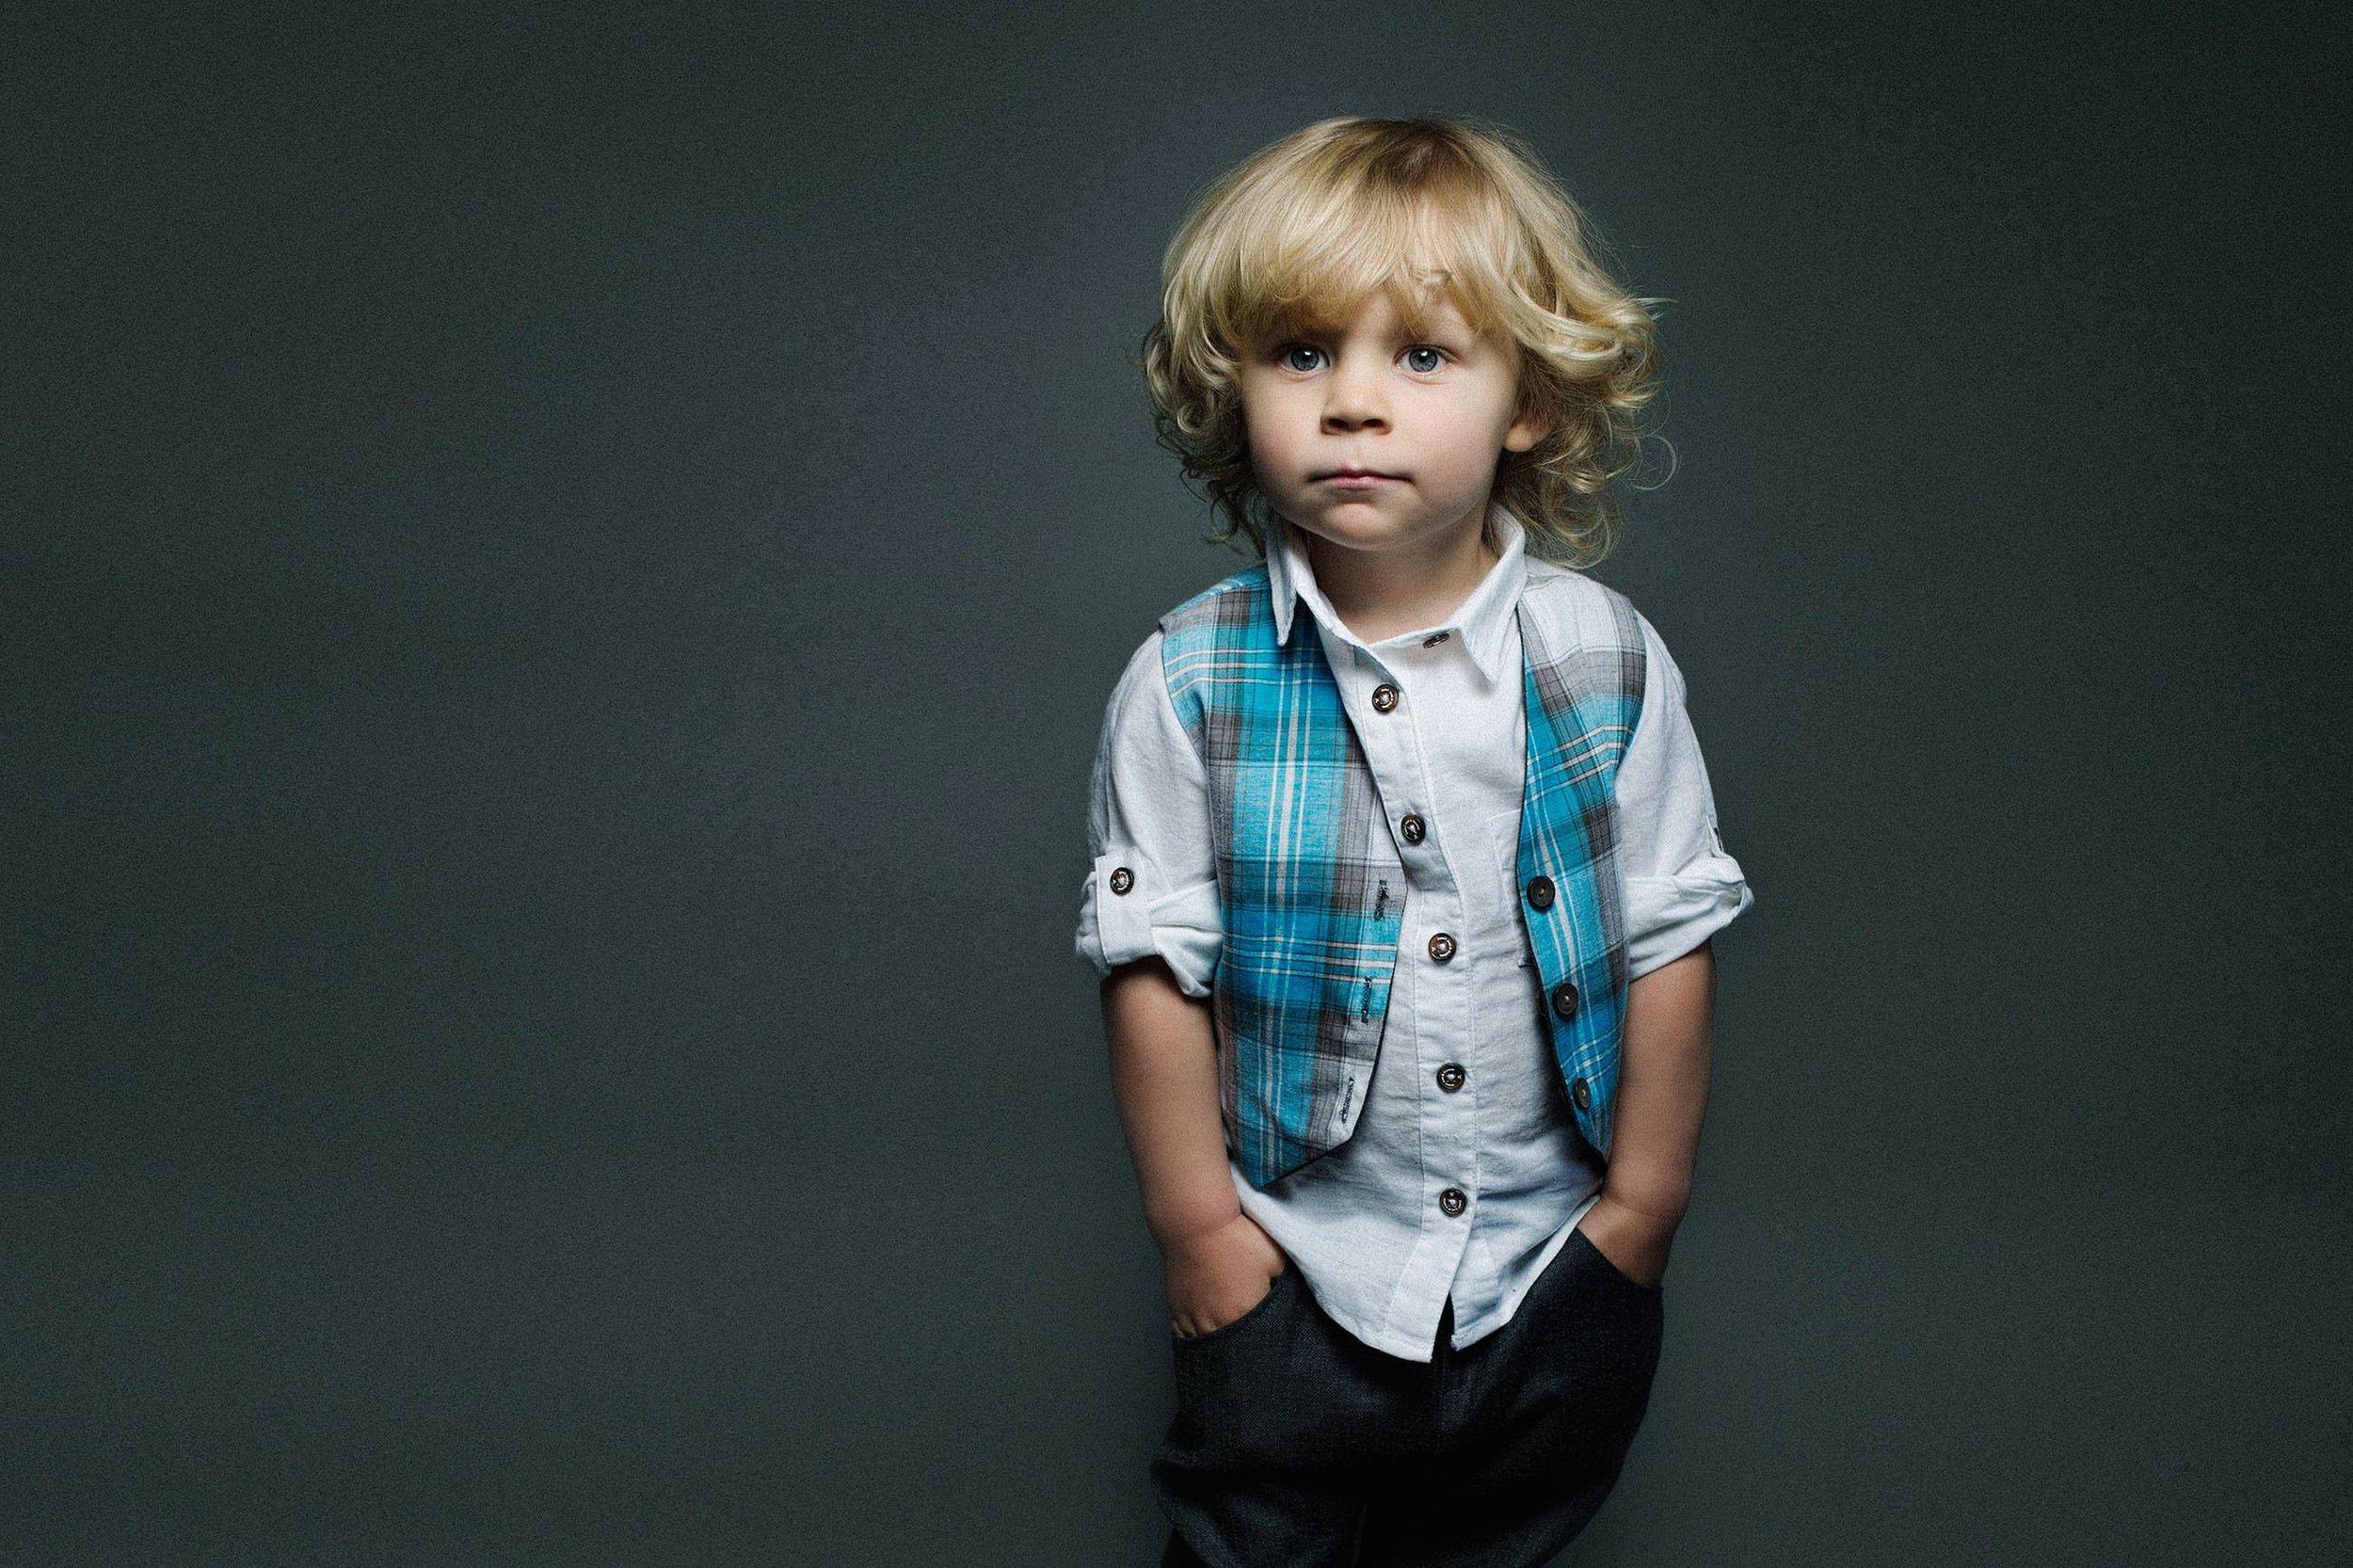 arkansas_children_child_portrait-016.jpg